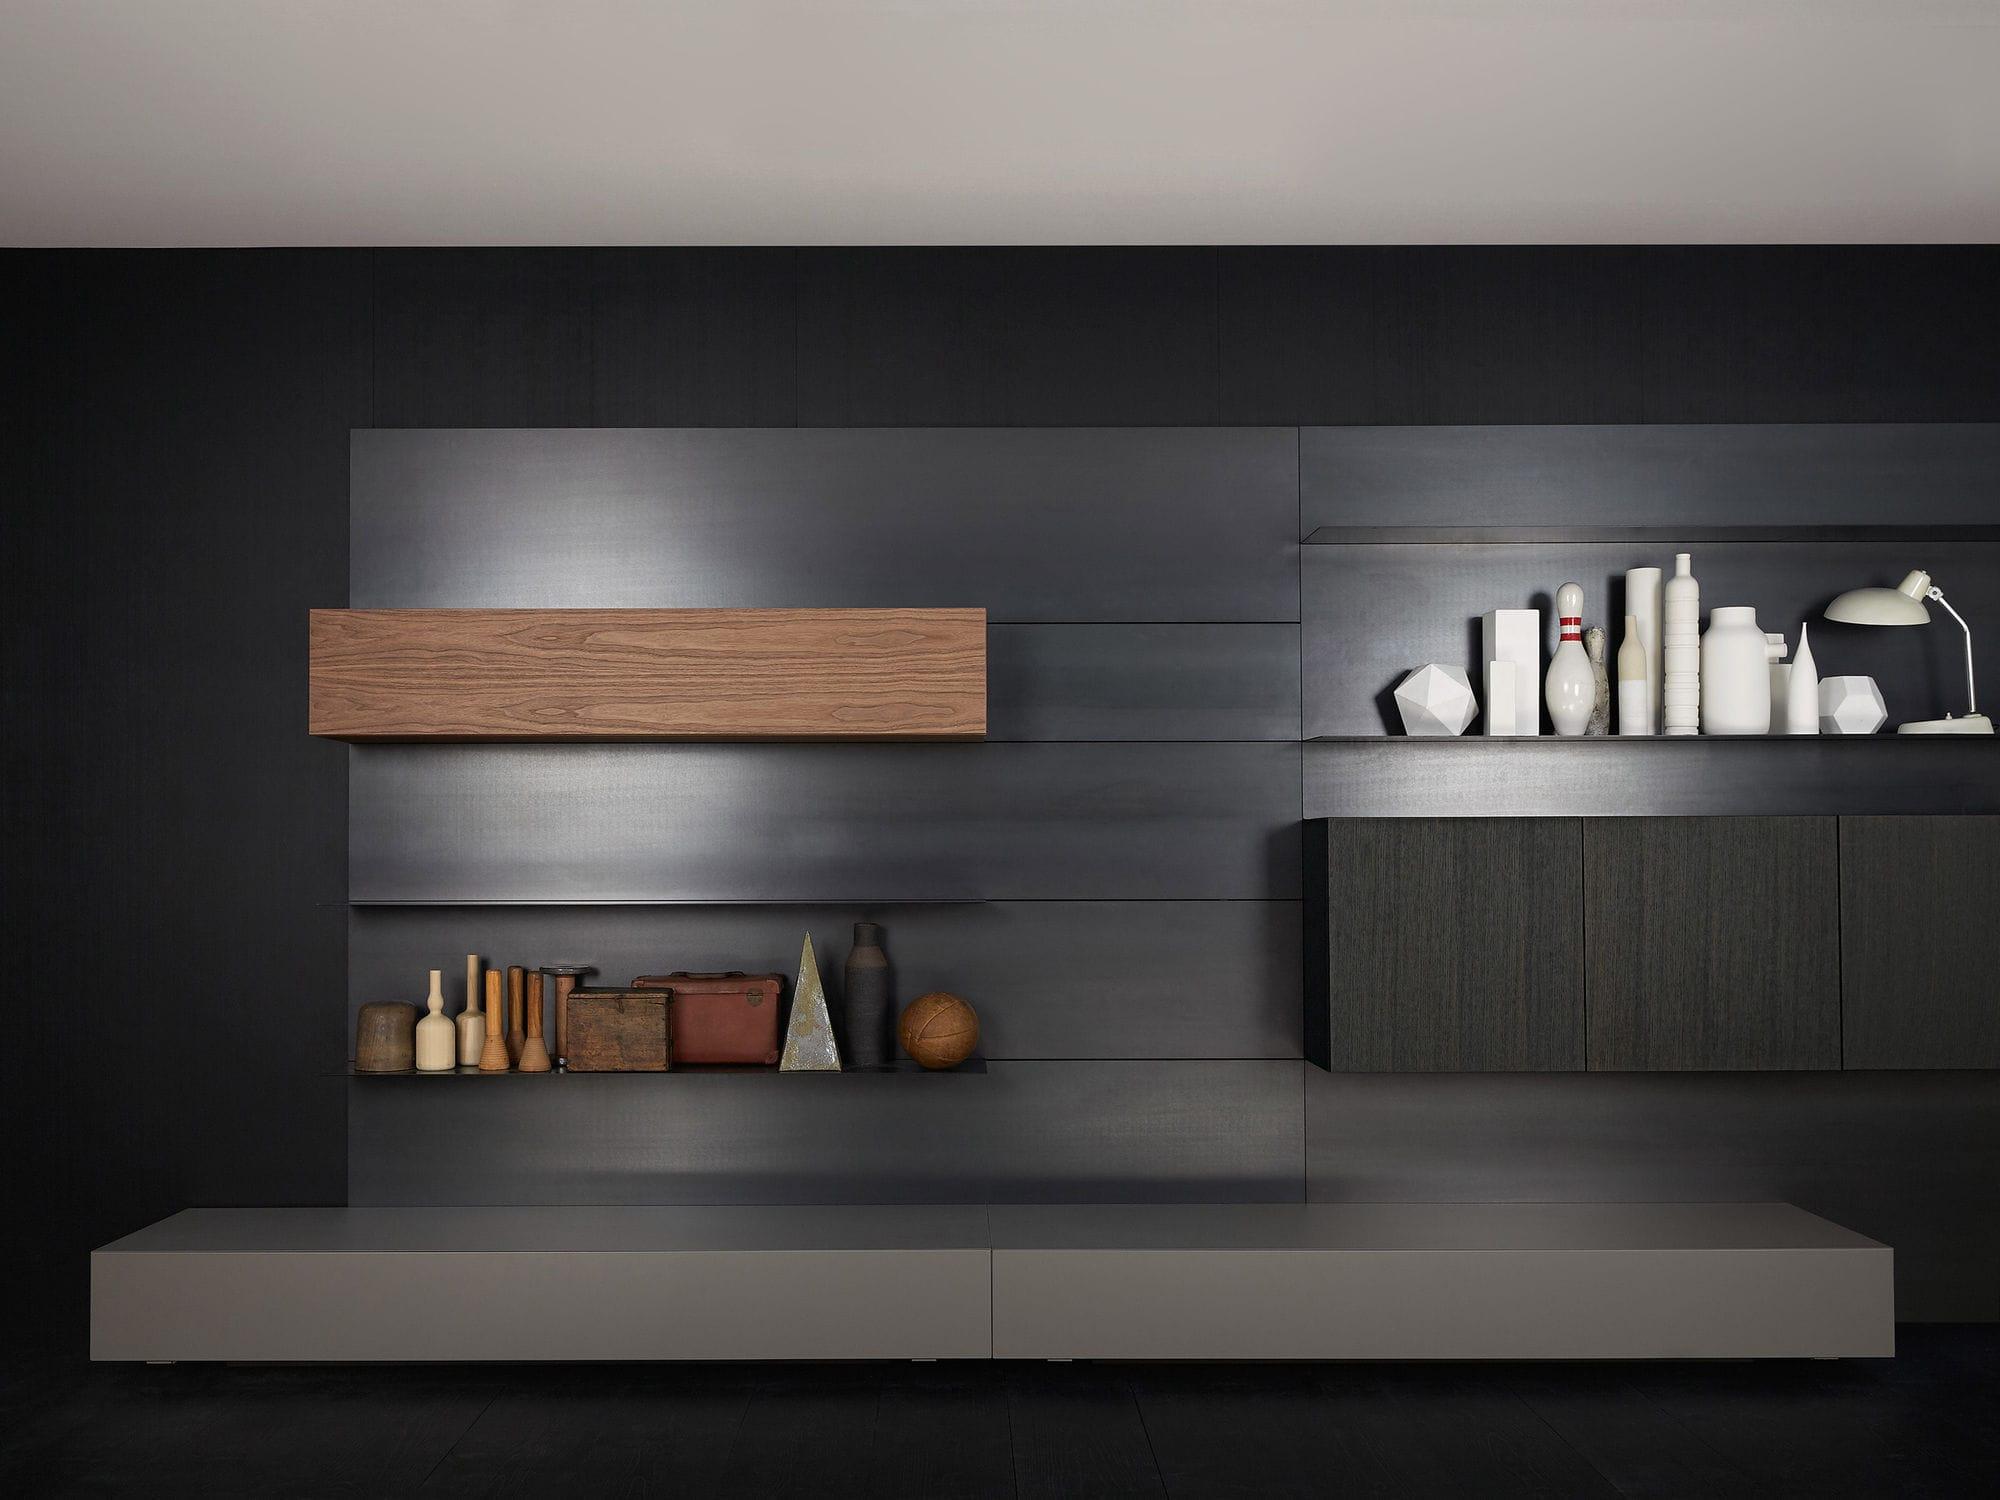 Wohnwand holz modern  Moderne Wohnwand / Holz / von Piero Lissoni - MODERN LIVING - Porro